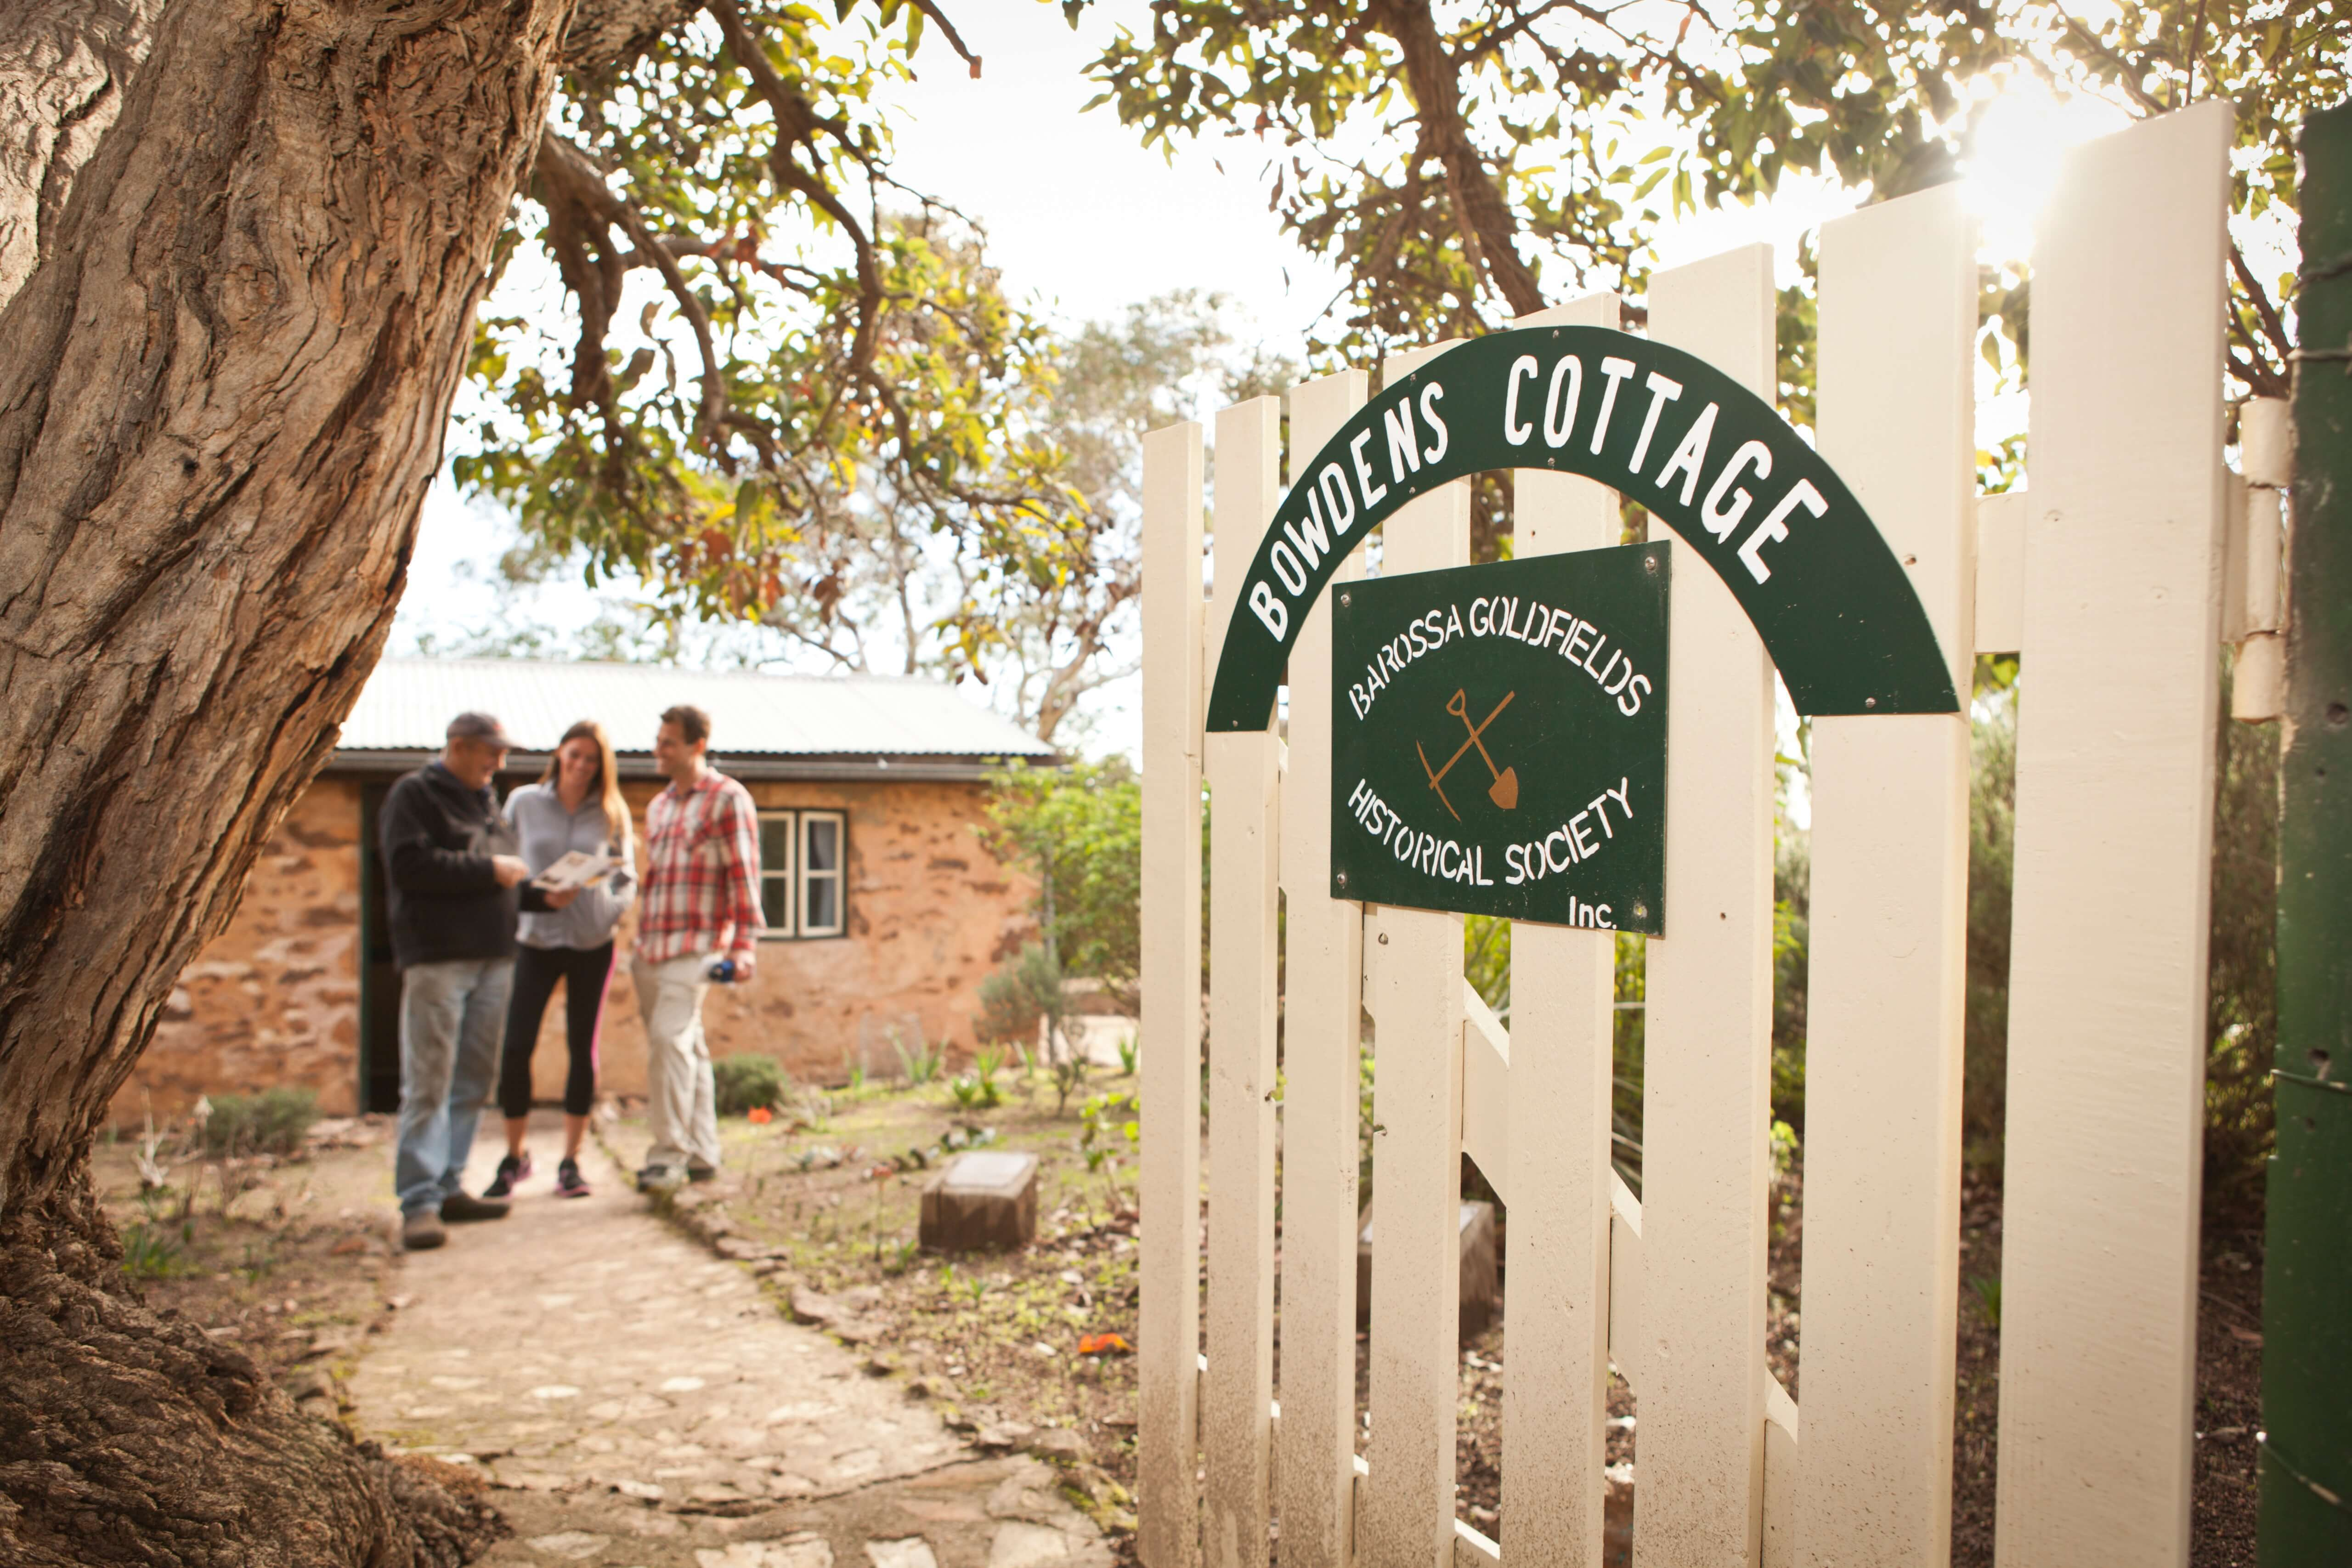 4. Bowdens Cottage 1.jpg